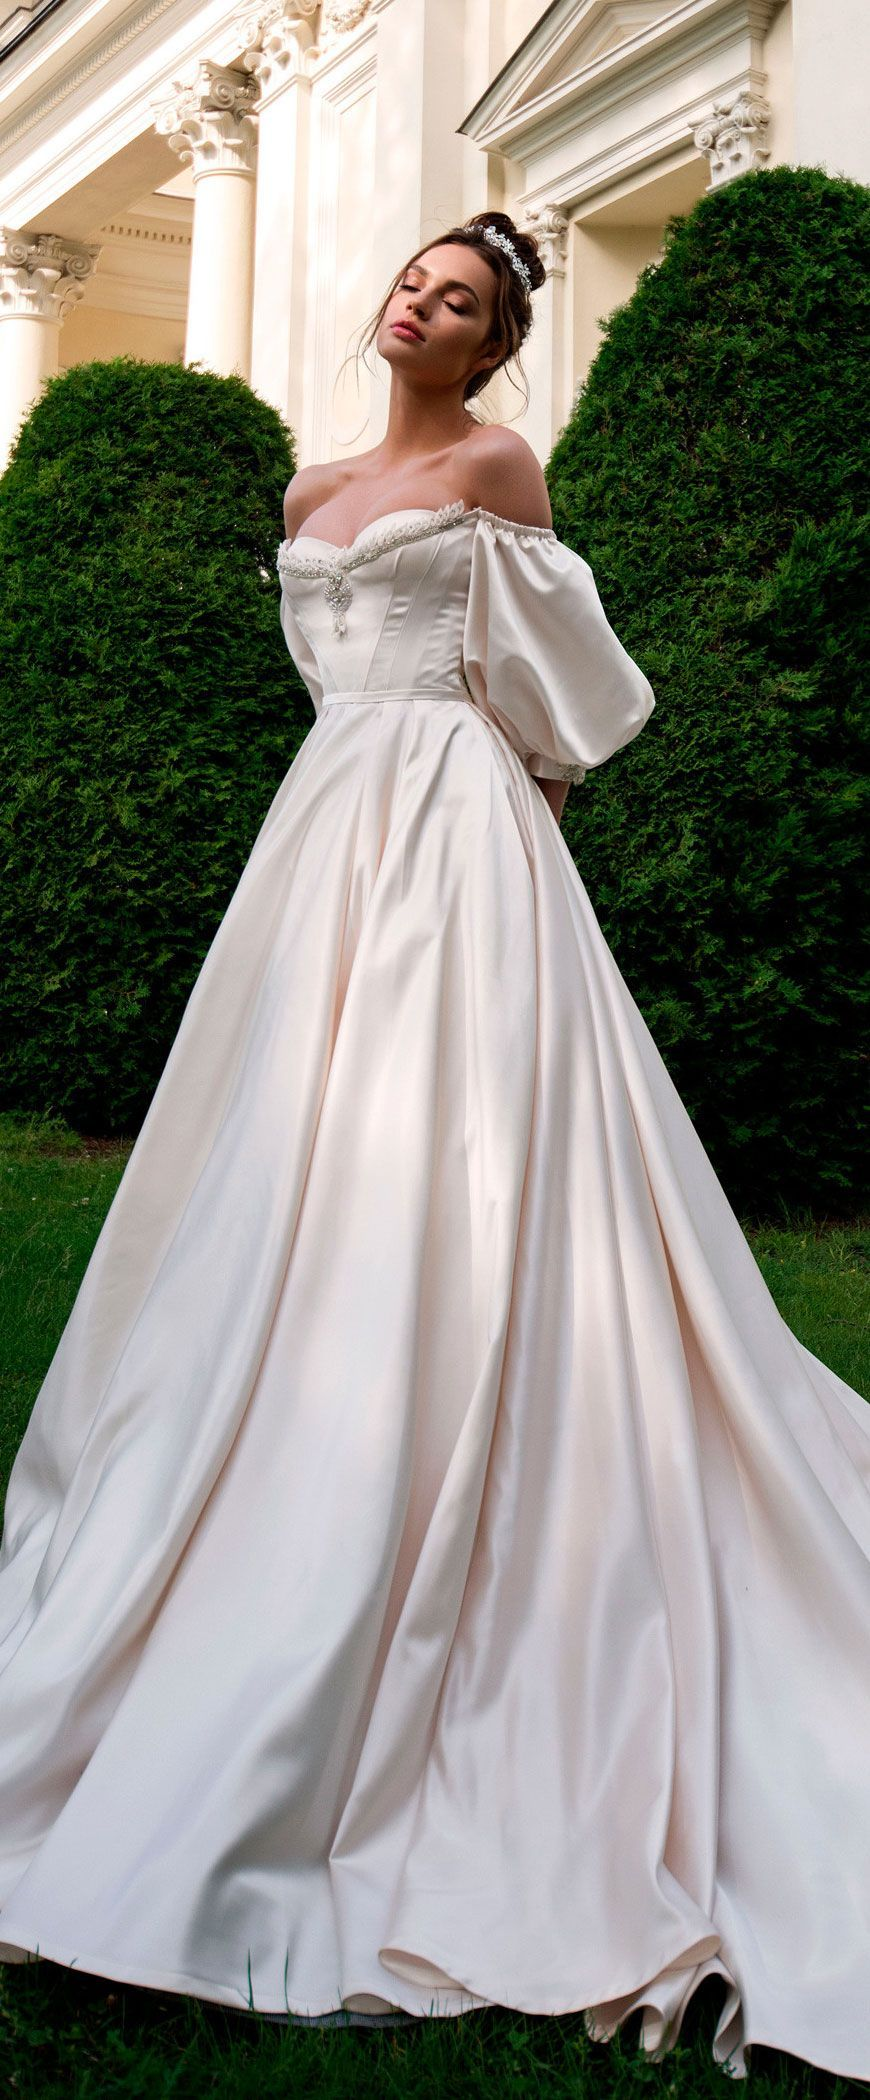 BLAMMO-BIAMO 2018 Wedding Dresses | Wedding bride, Chapel train and ...